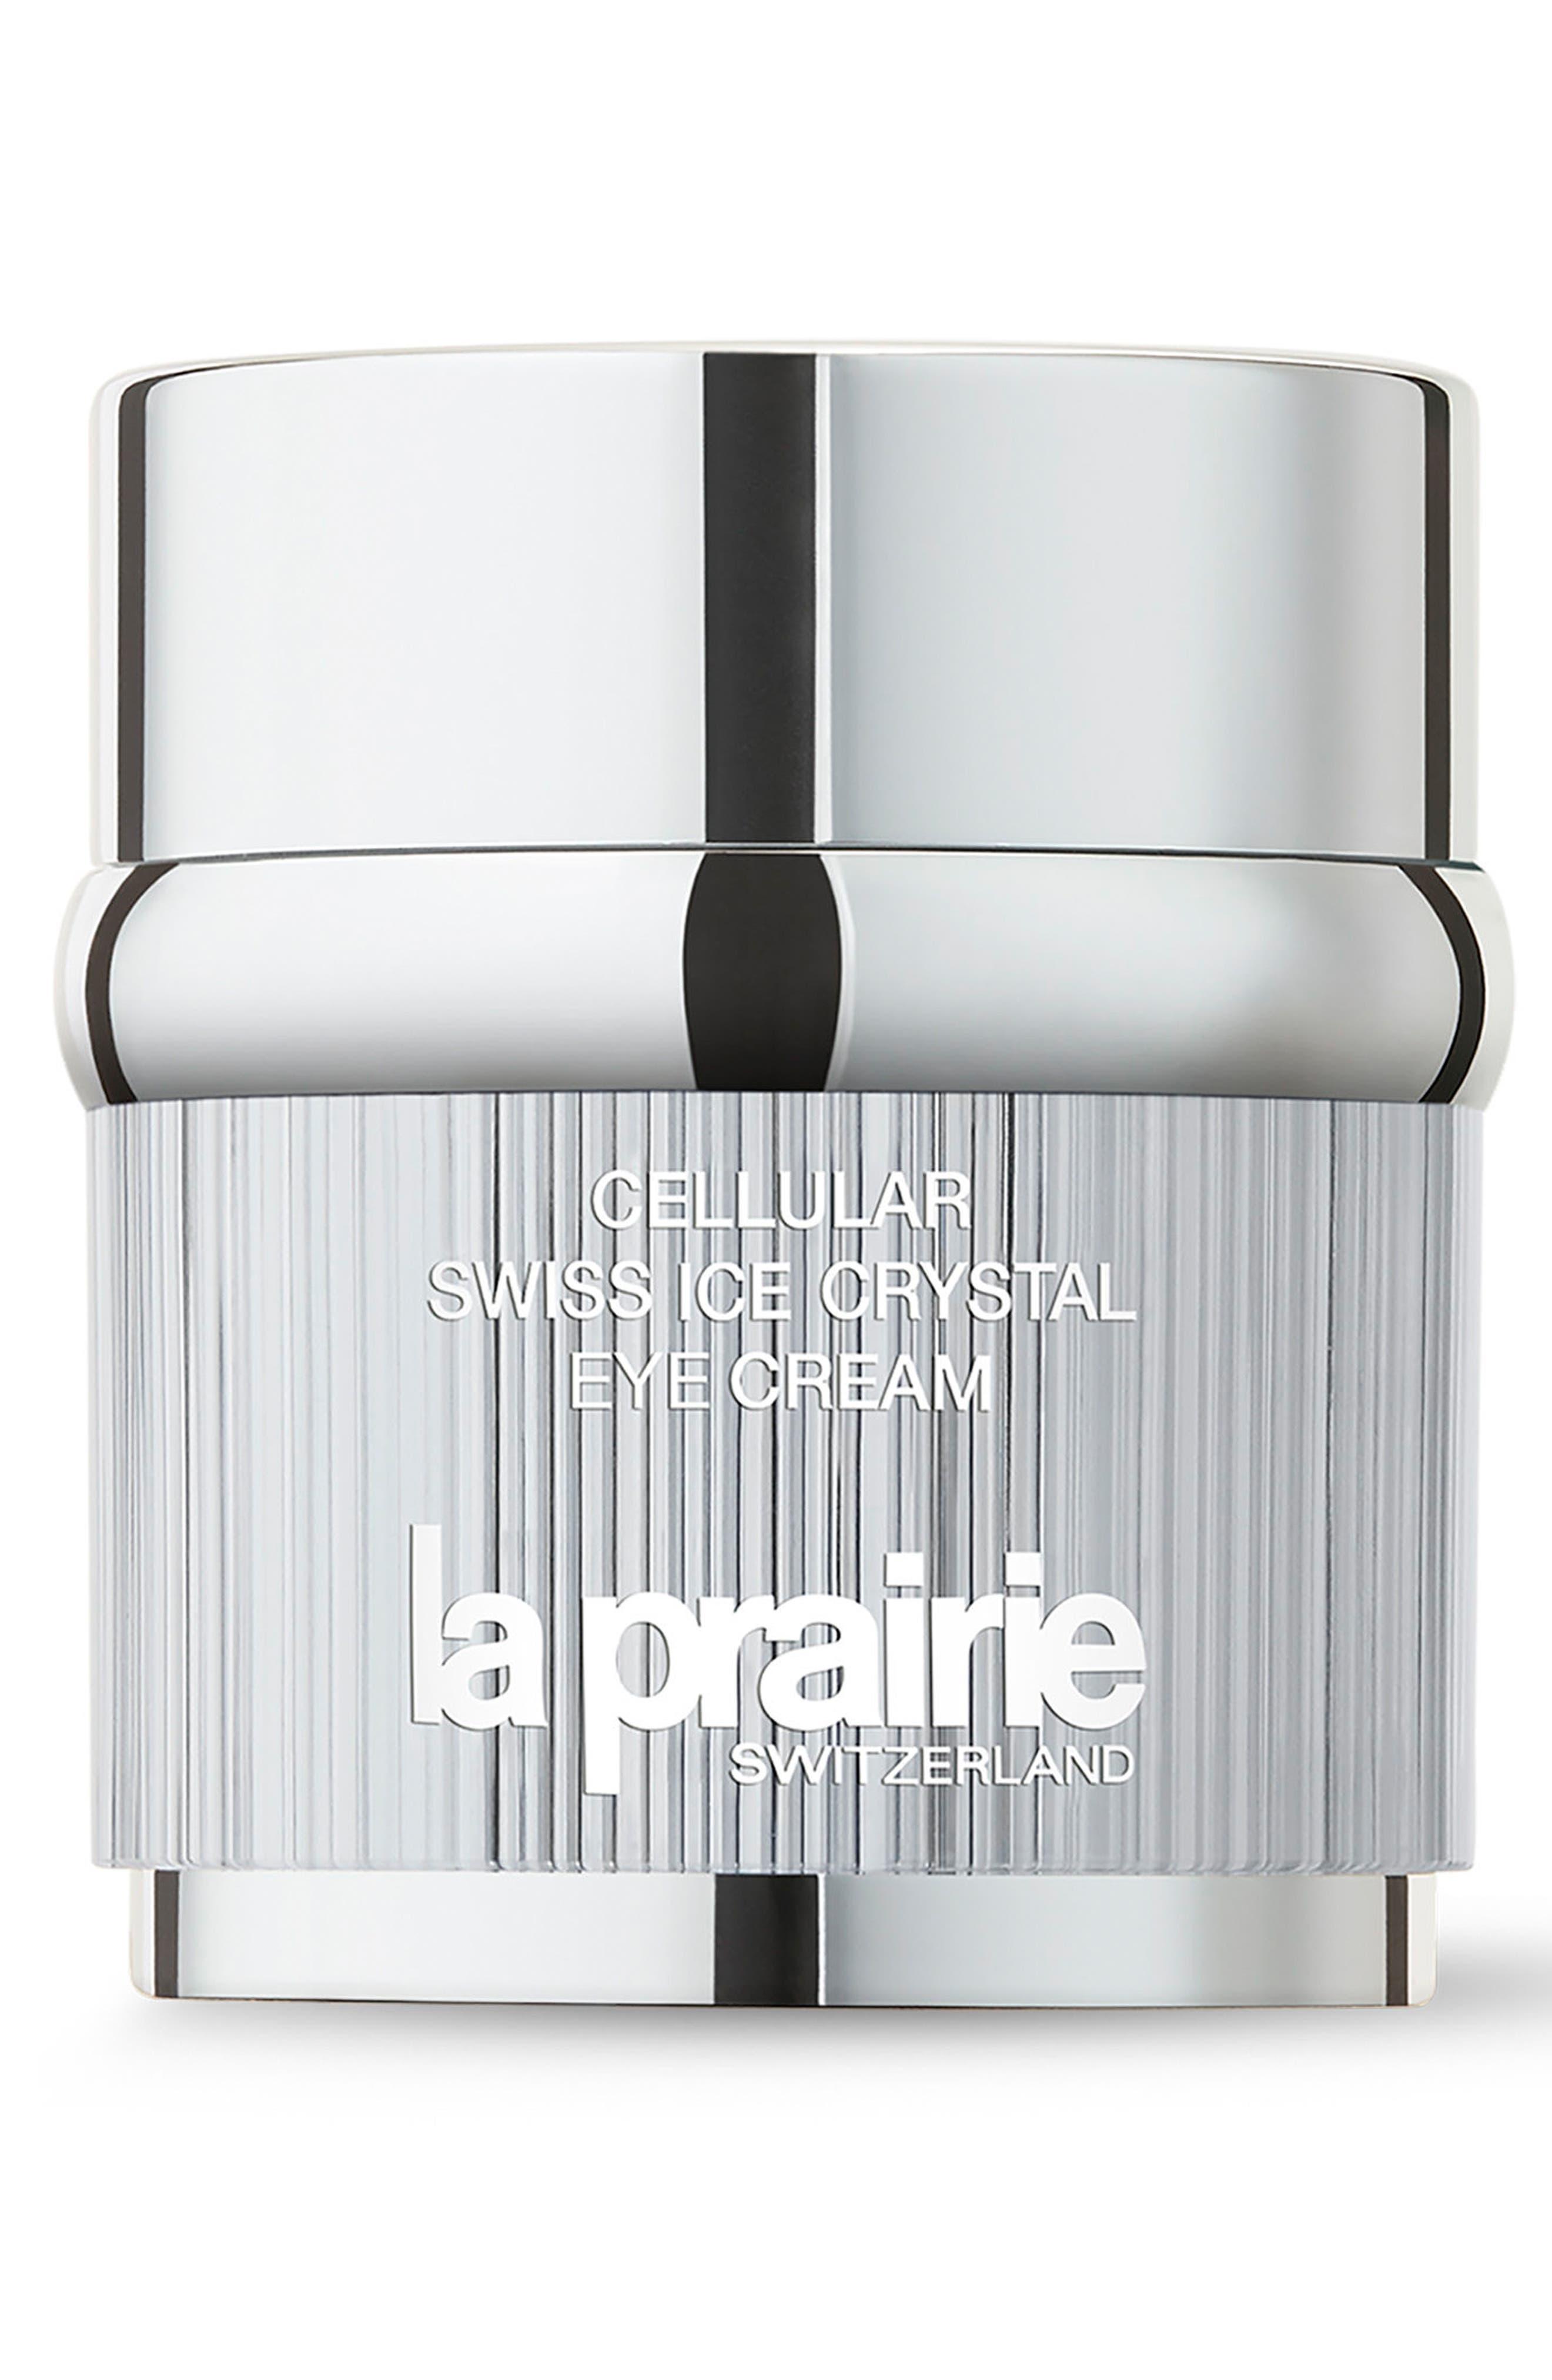 Alternate Image 1 Selected - La Prairie Cellular Swiss Ice Crystal Eye Cream